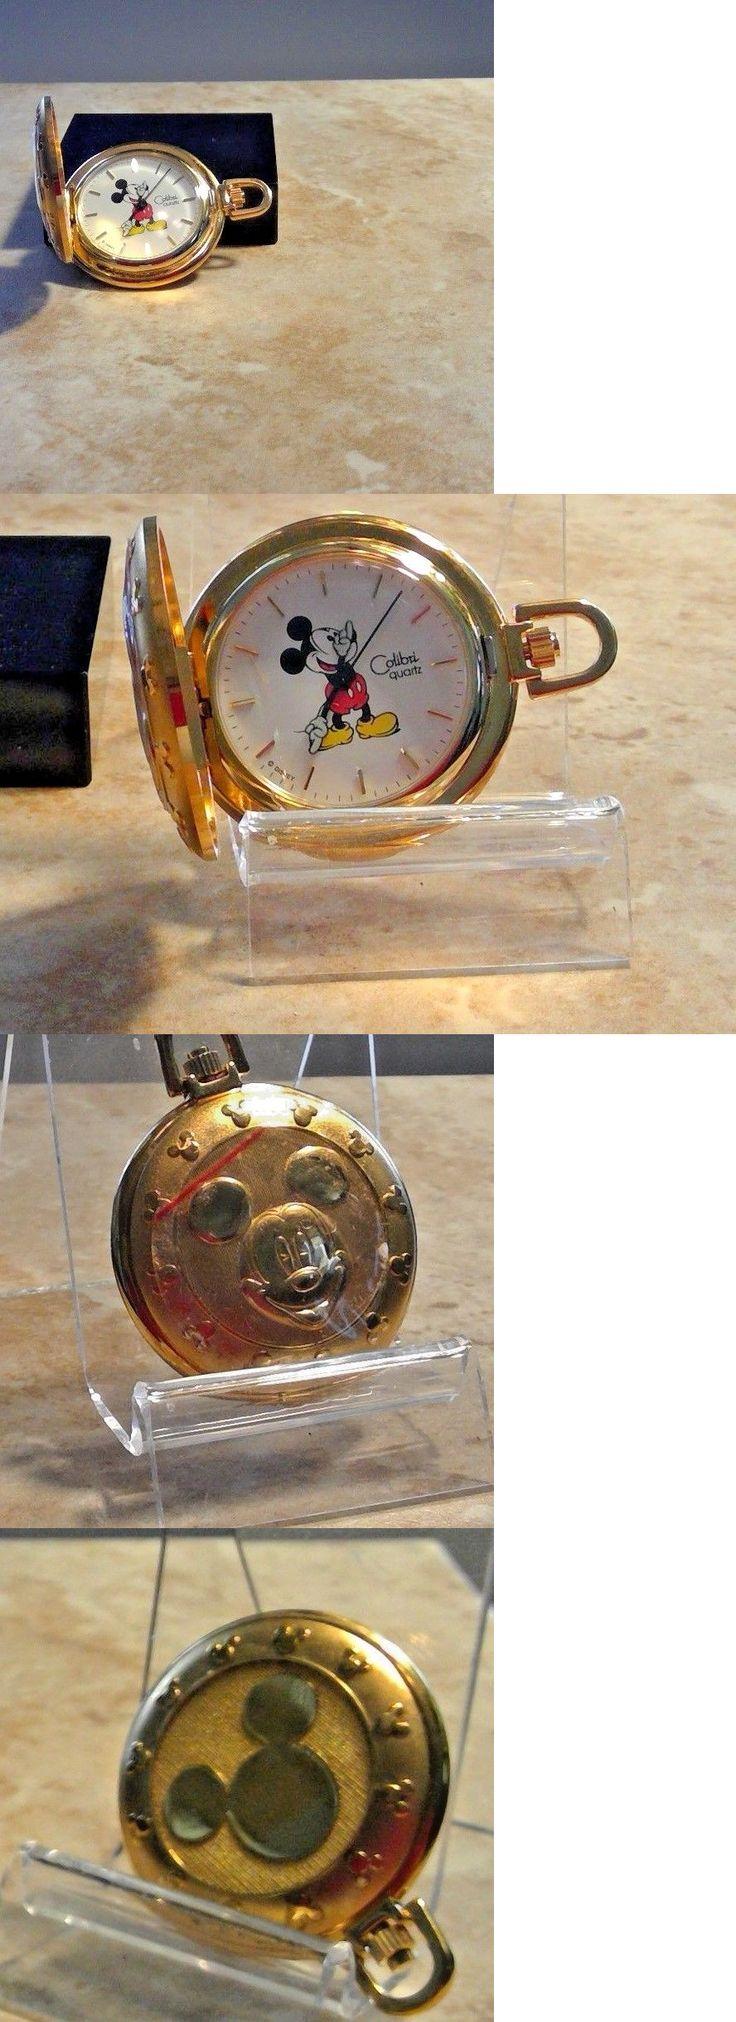 Modern 3938: Vintage Gold Colibri Pocket Watch Mickey Mouse Disney Rare Piece -> BUY IT NOW ONLY: $39.99 on eBay!